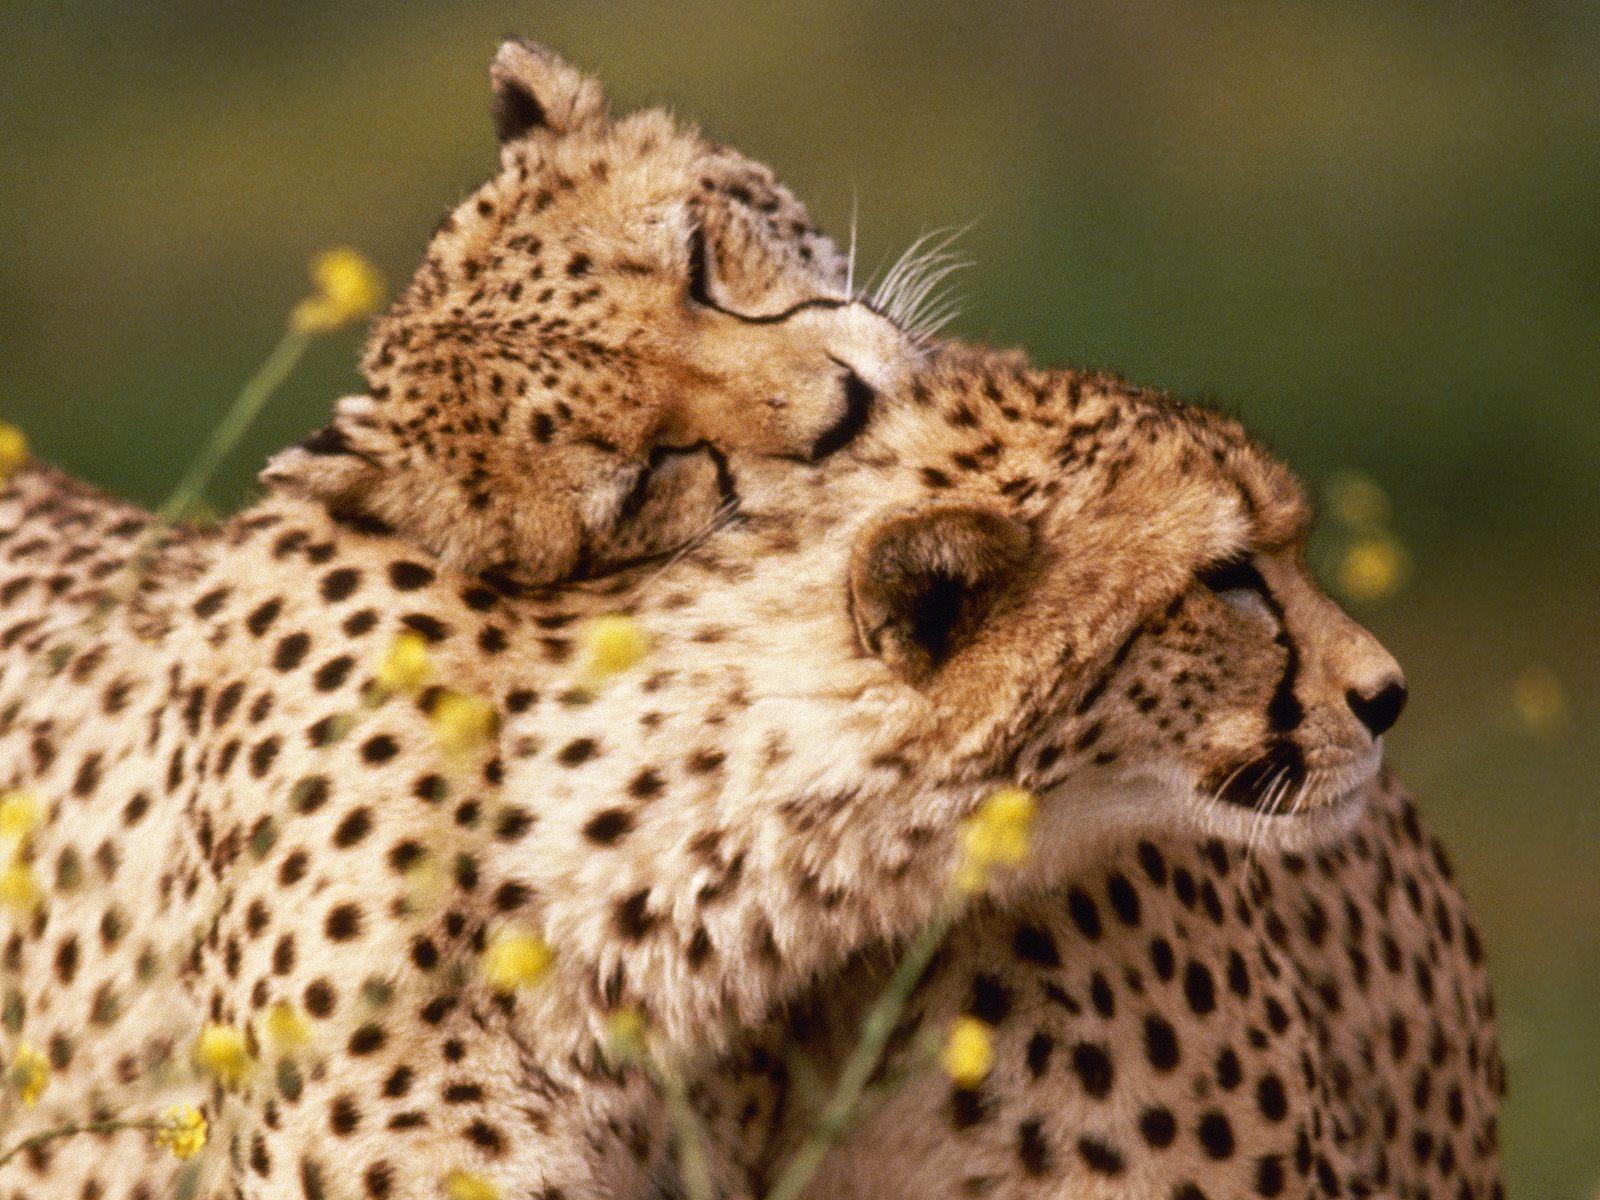 affectionate cheetahs wallpapers - Affectionate Cheetahs Wallpapers HD Wallpapers